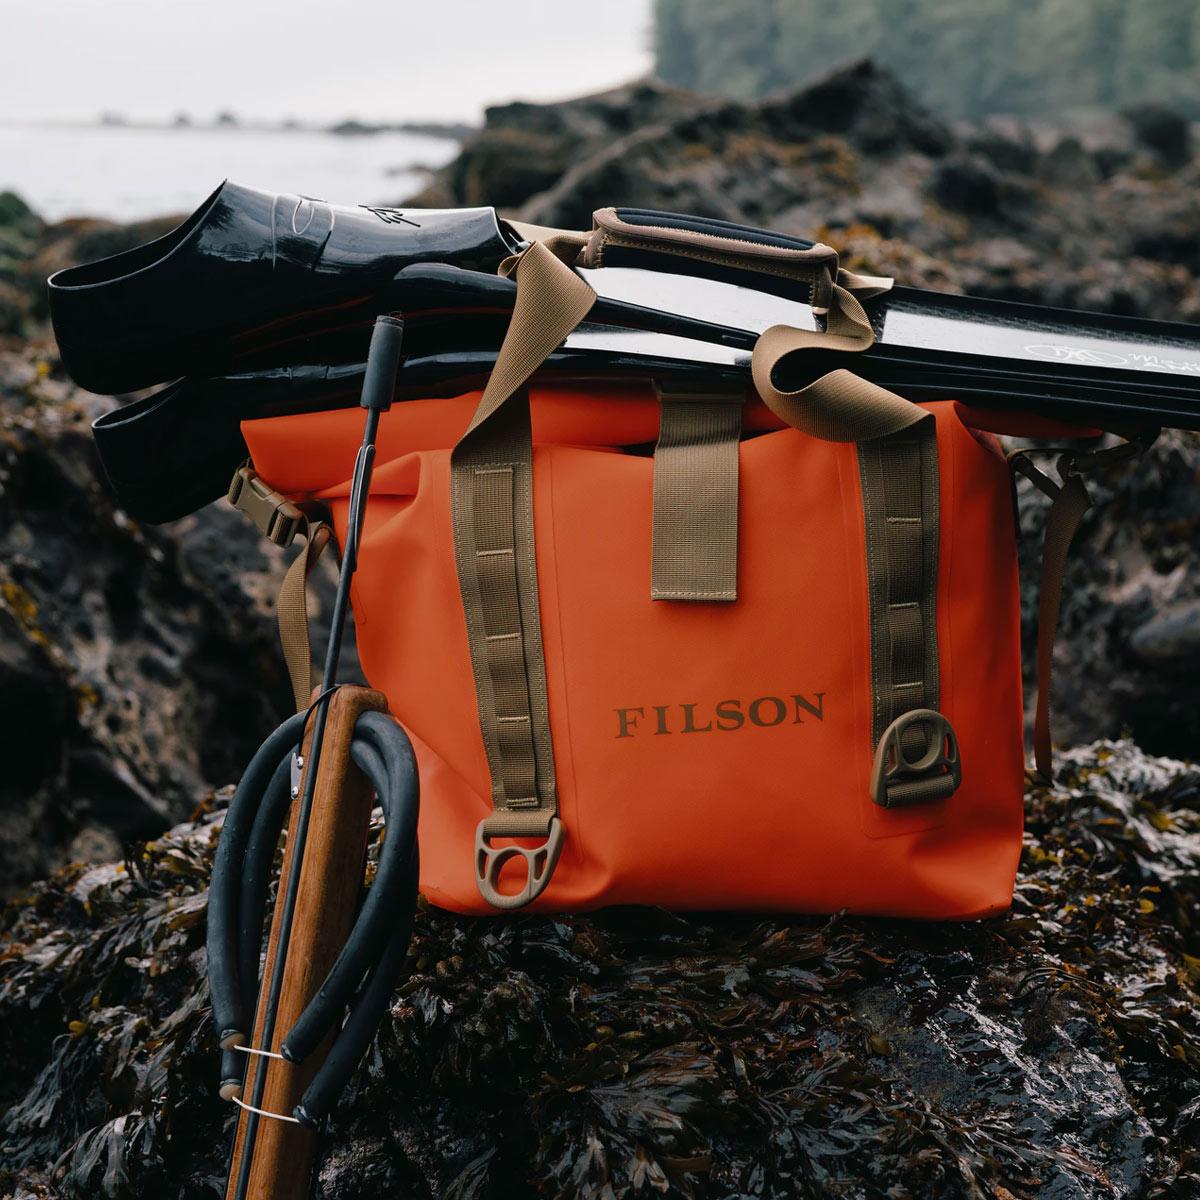 Filson Dry Roll-Top Tote Bag Flame, houdt je uitrusting droog in alle weersomstandigheden